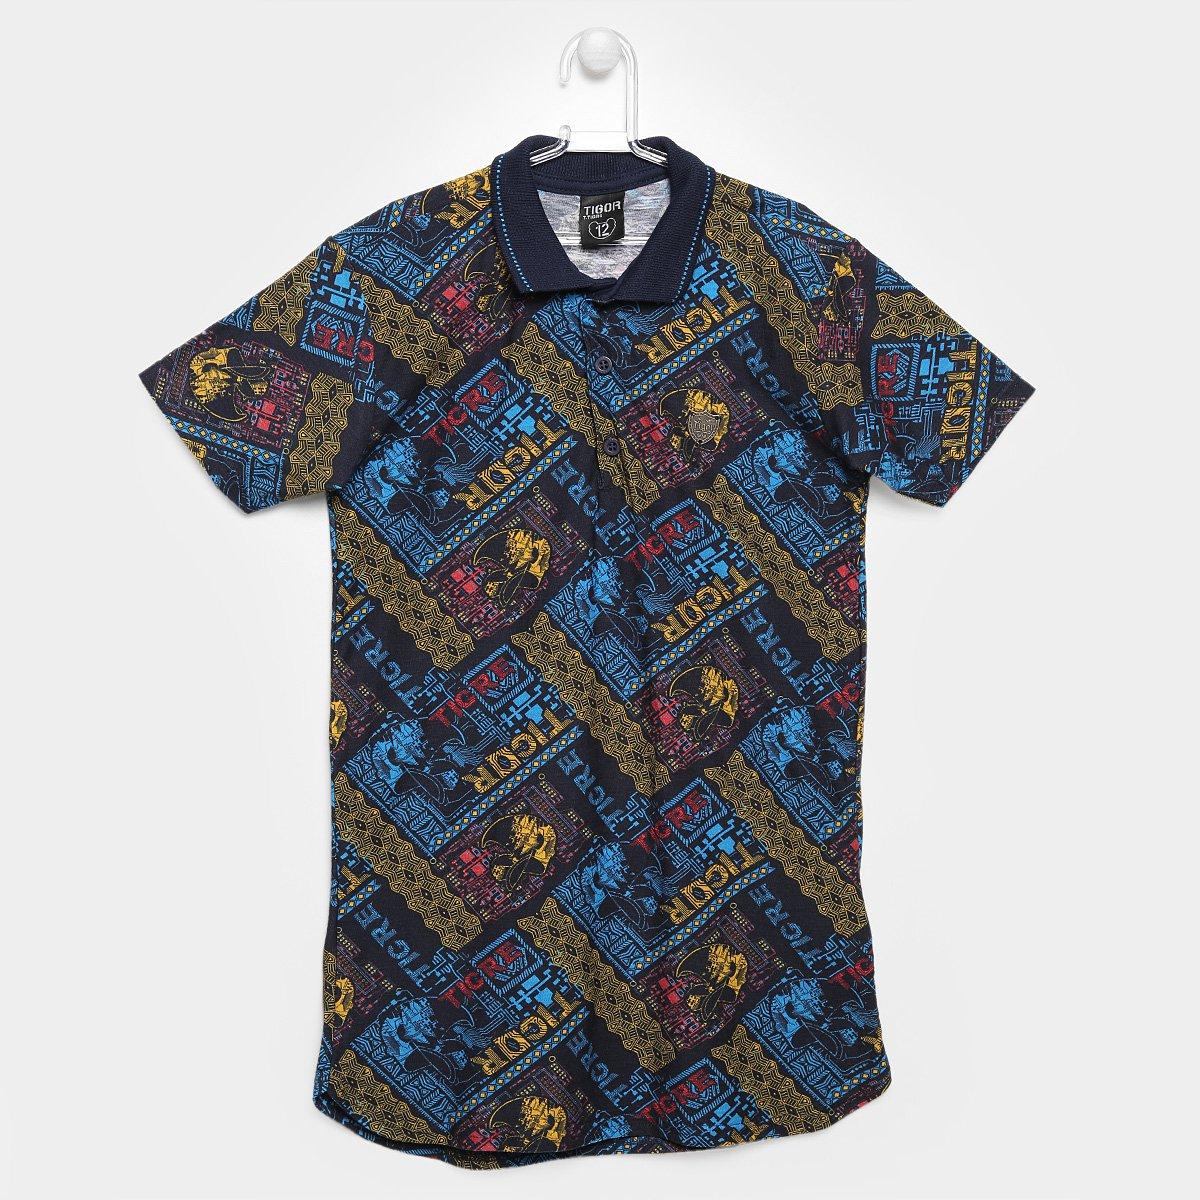 54ff270d1 Camisa Polo Tigor T. Tigre Infantil